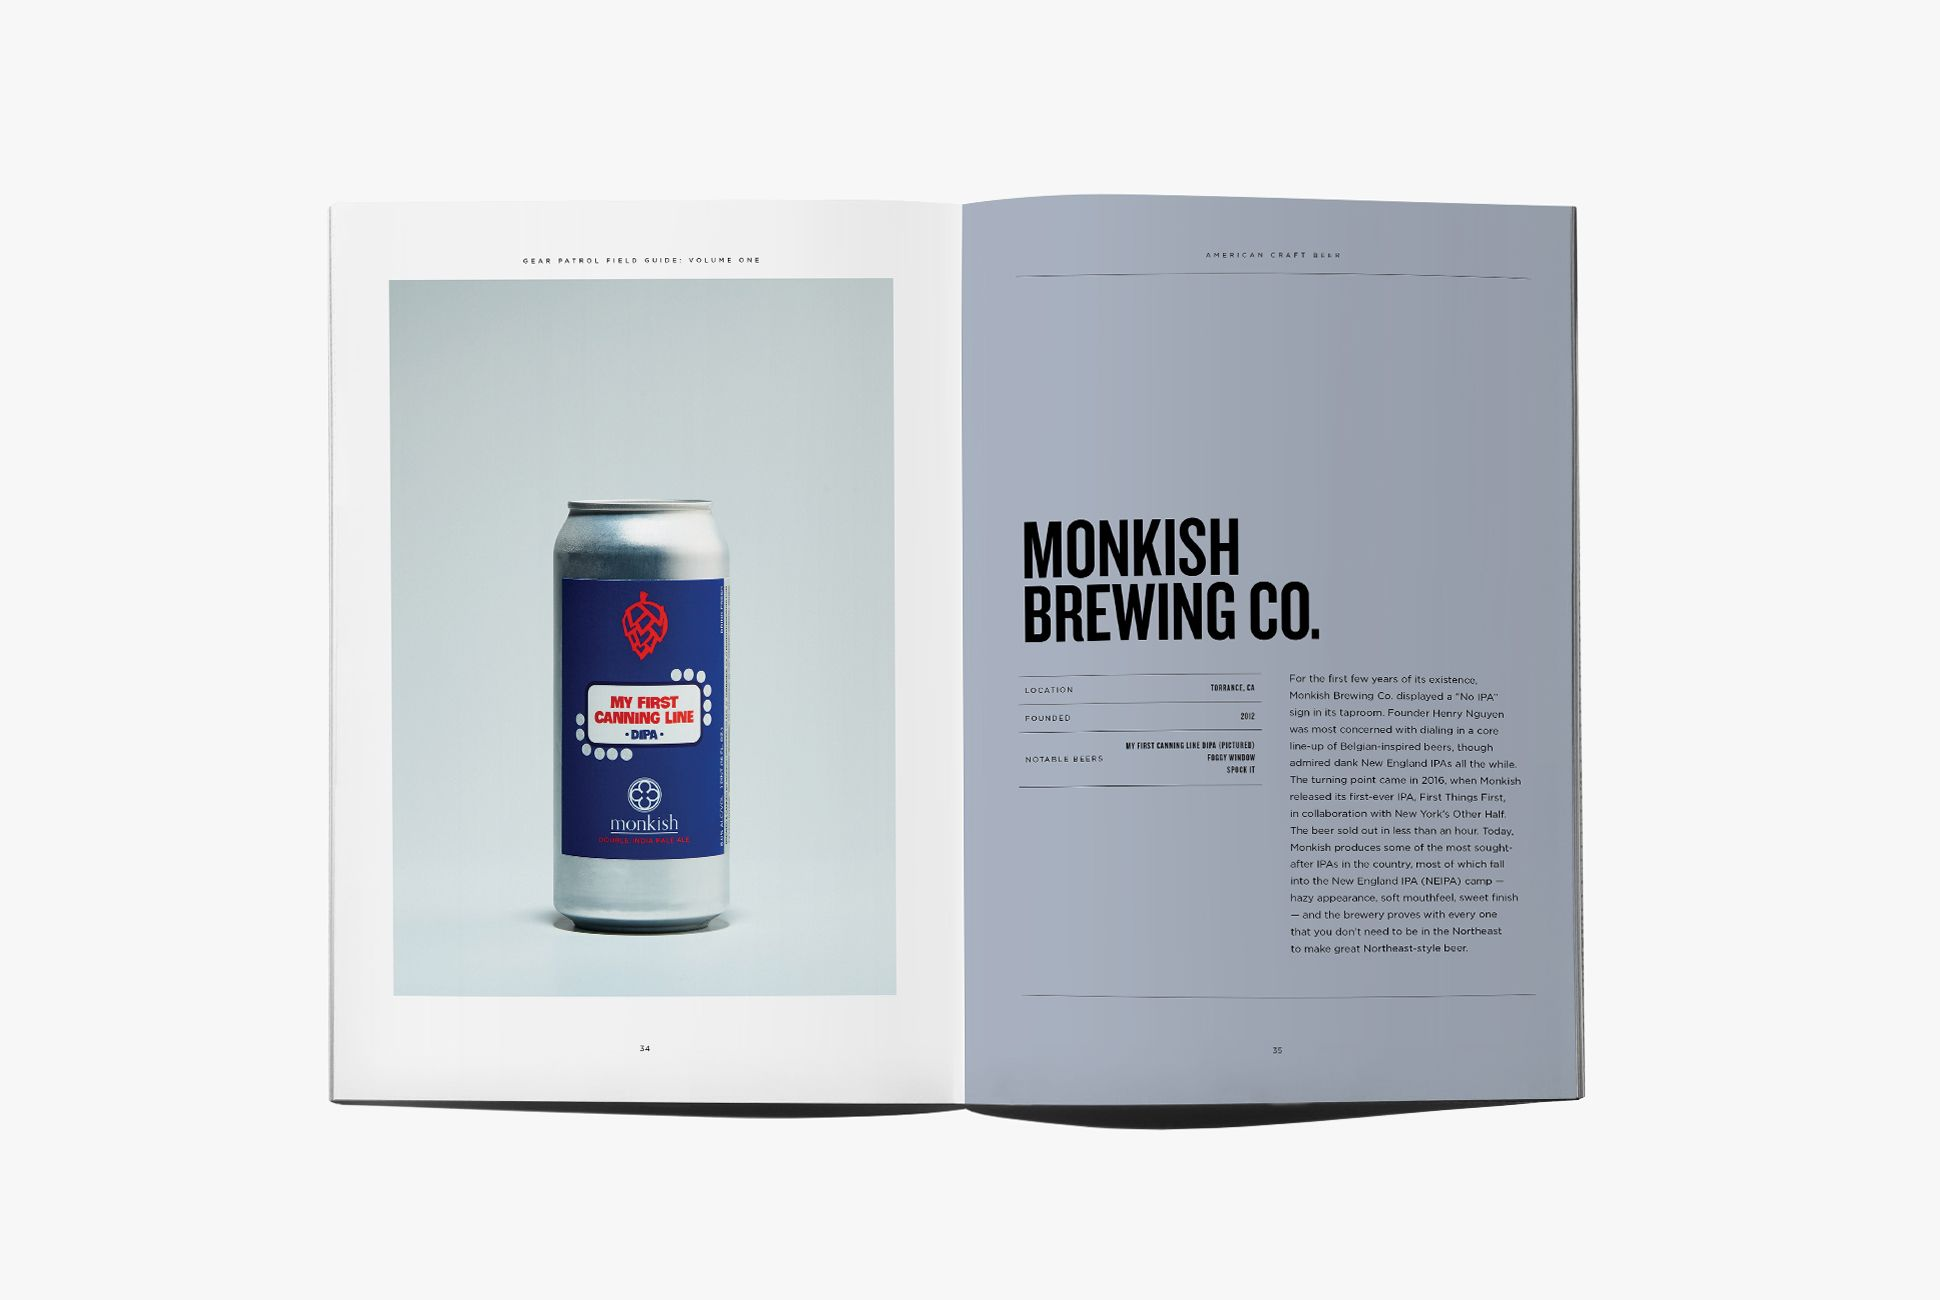 gear-patrol-beer-zine-970-7